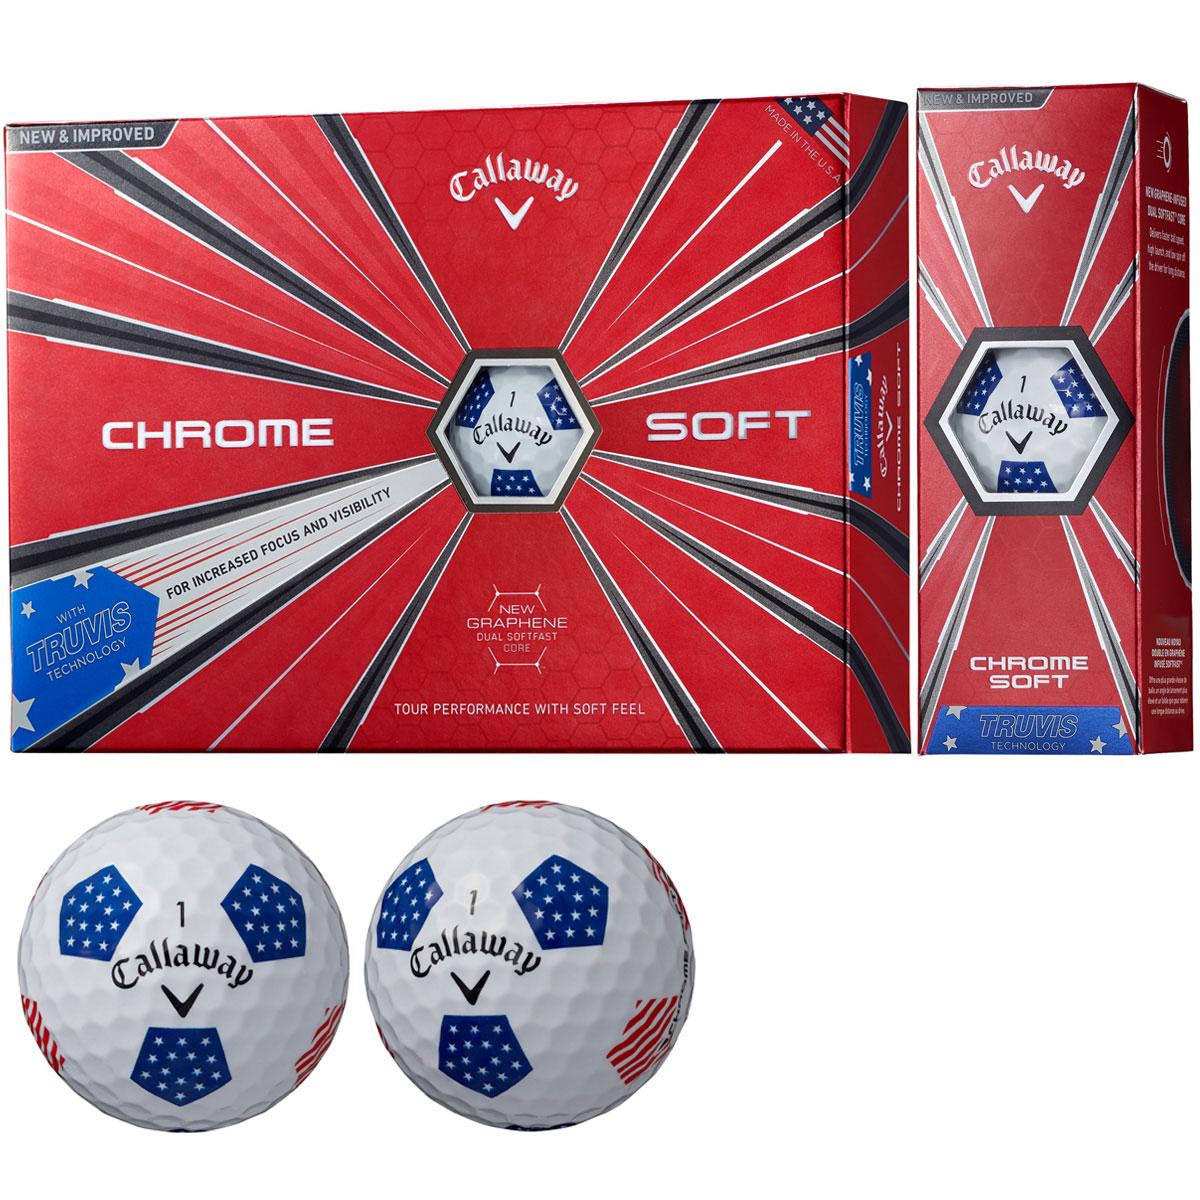 CHROME SOFT 18 TRUVIS ボール